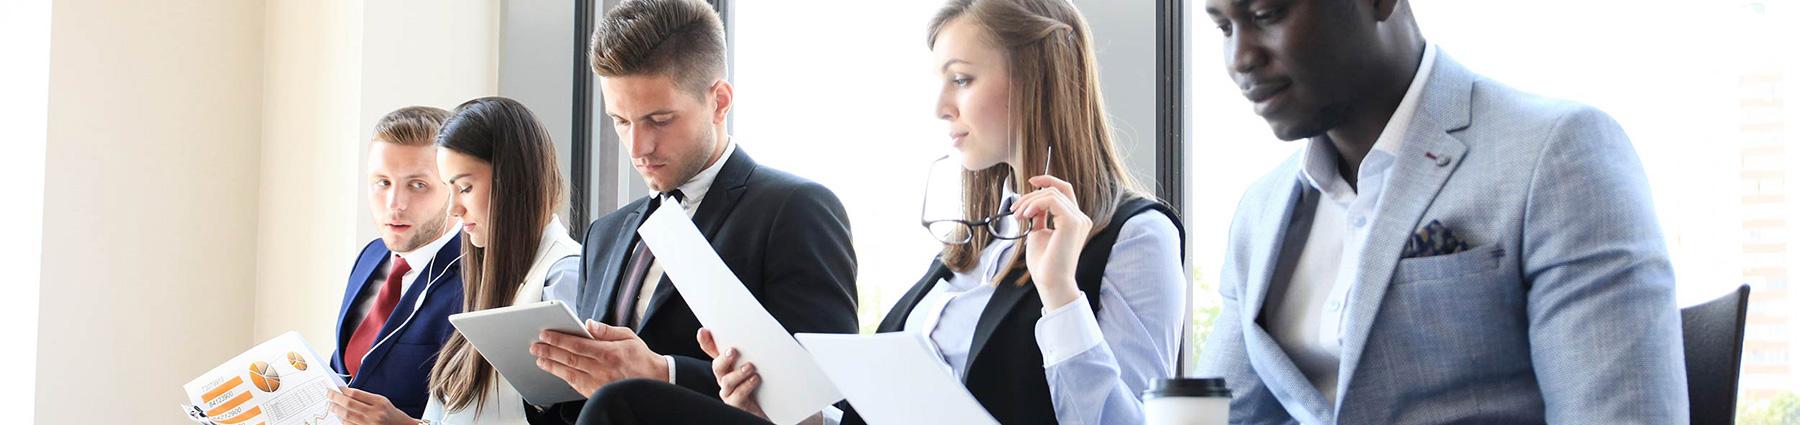 Gold Coast executive recruitment positions